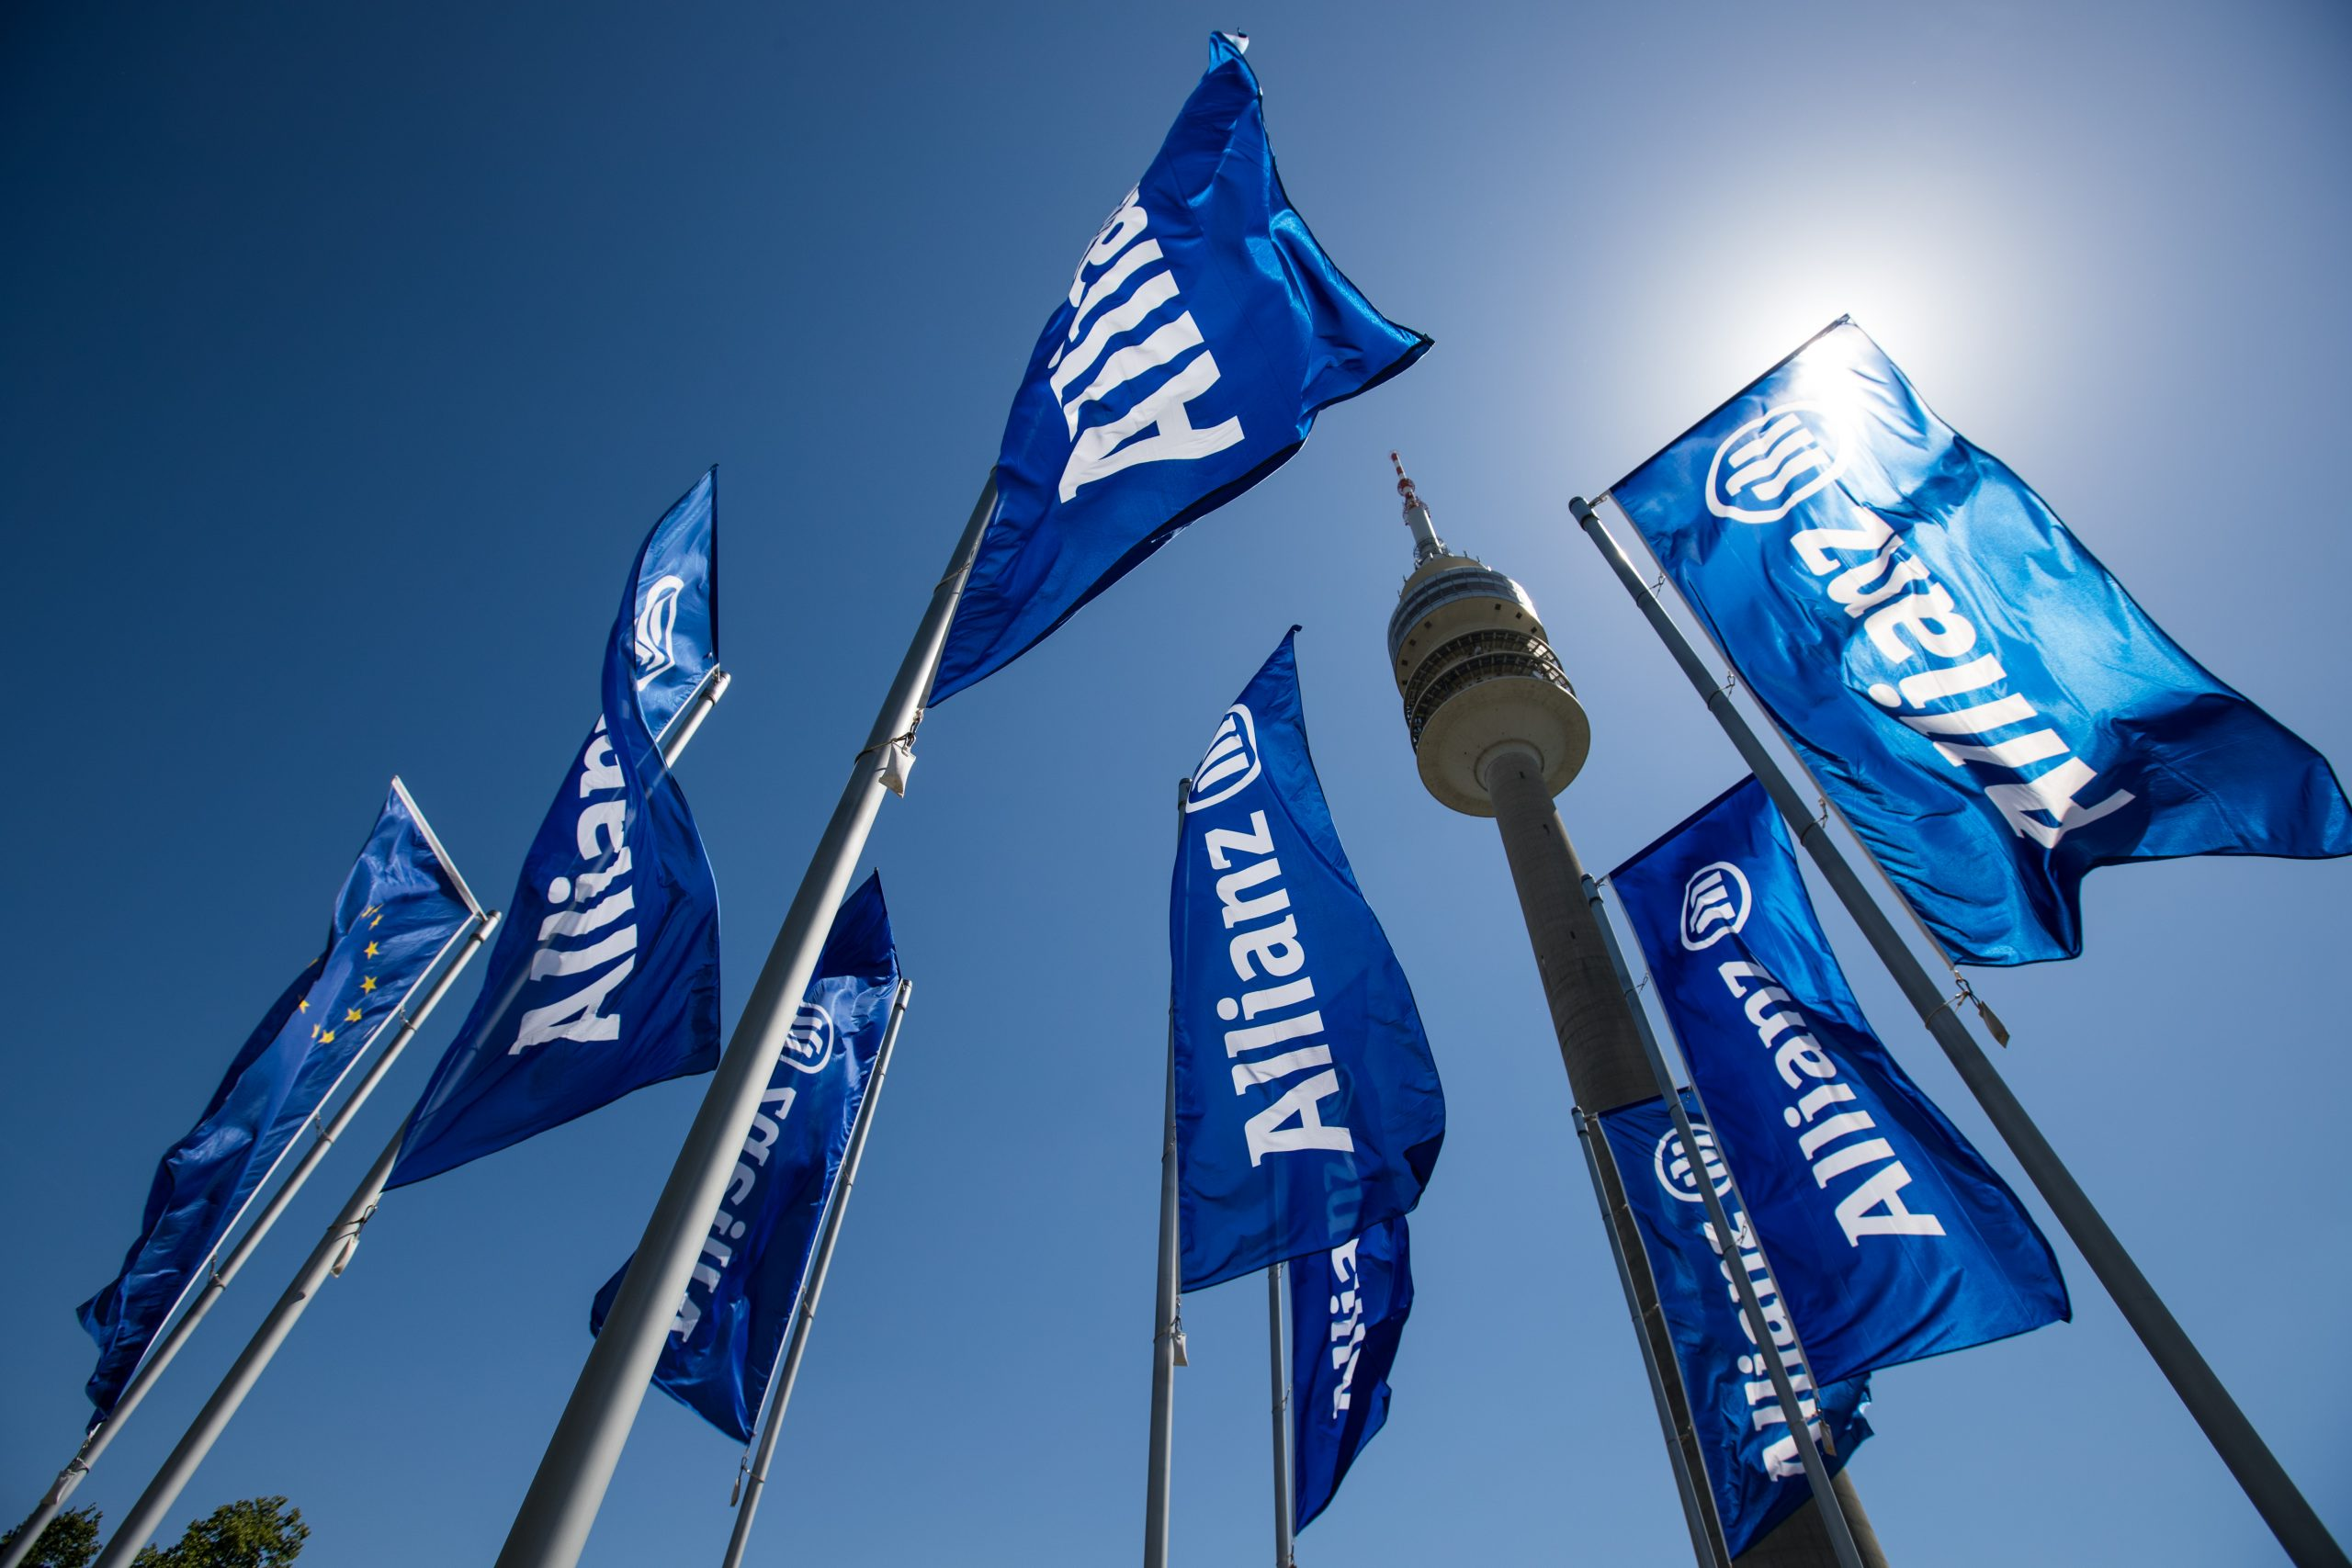 Drapeaux Allianz